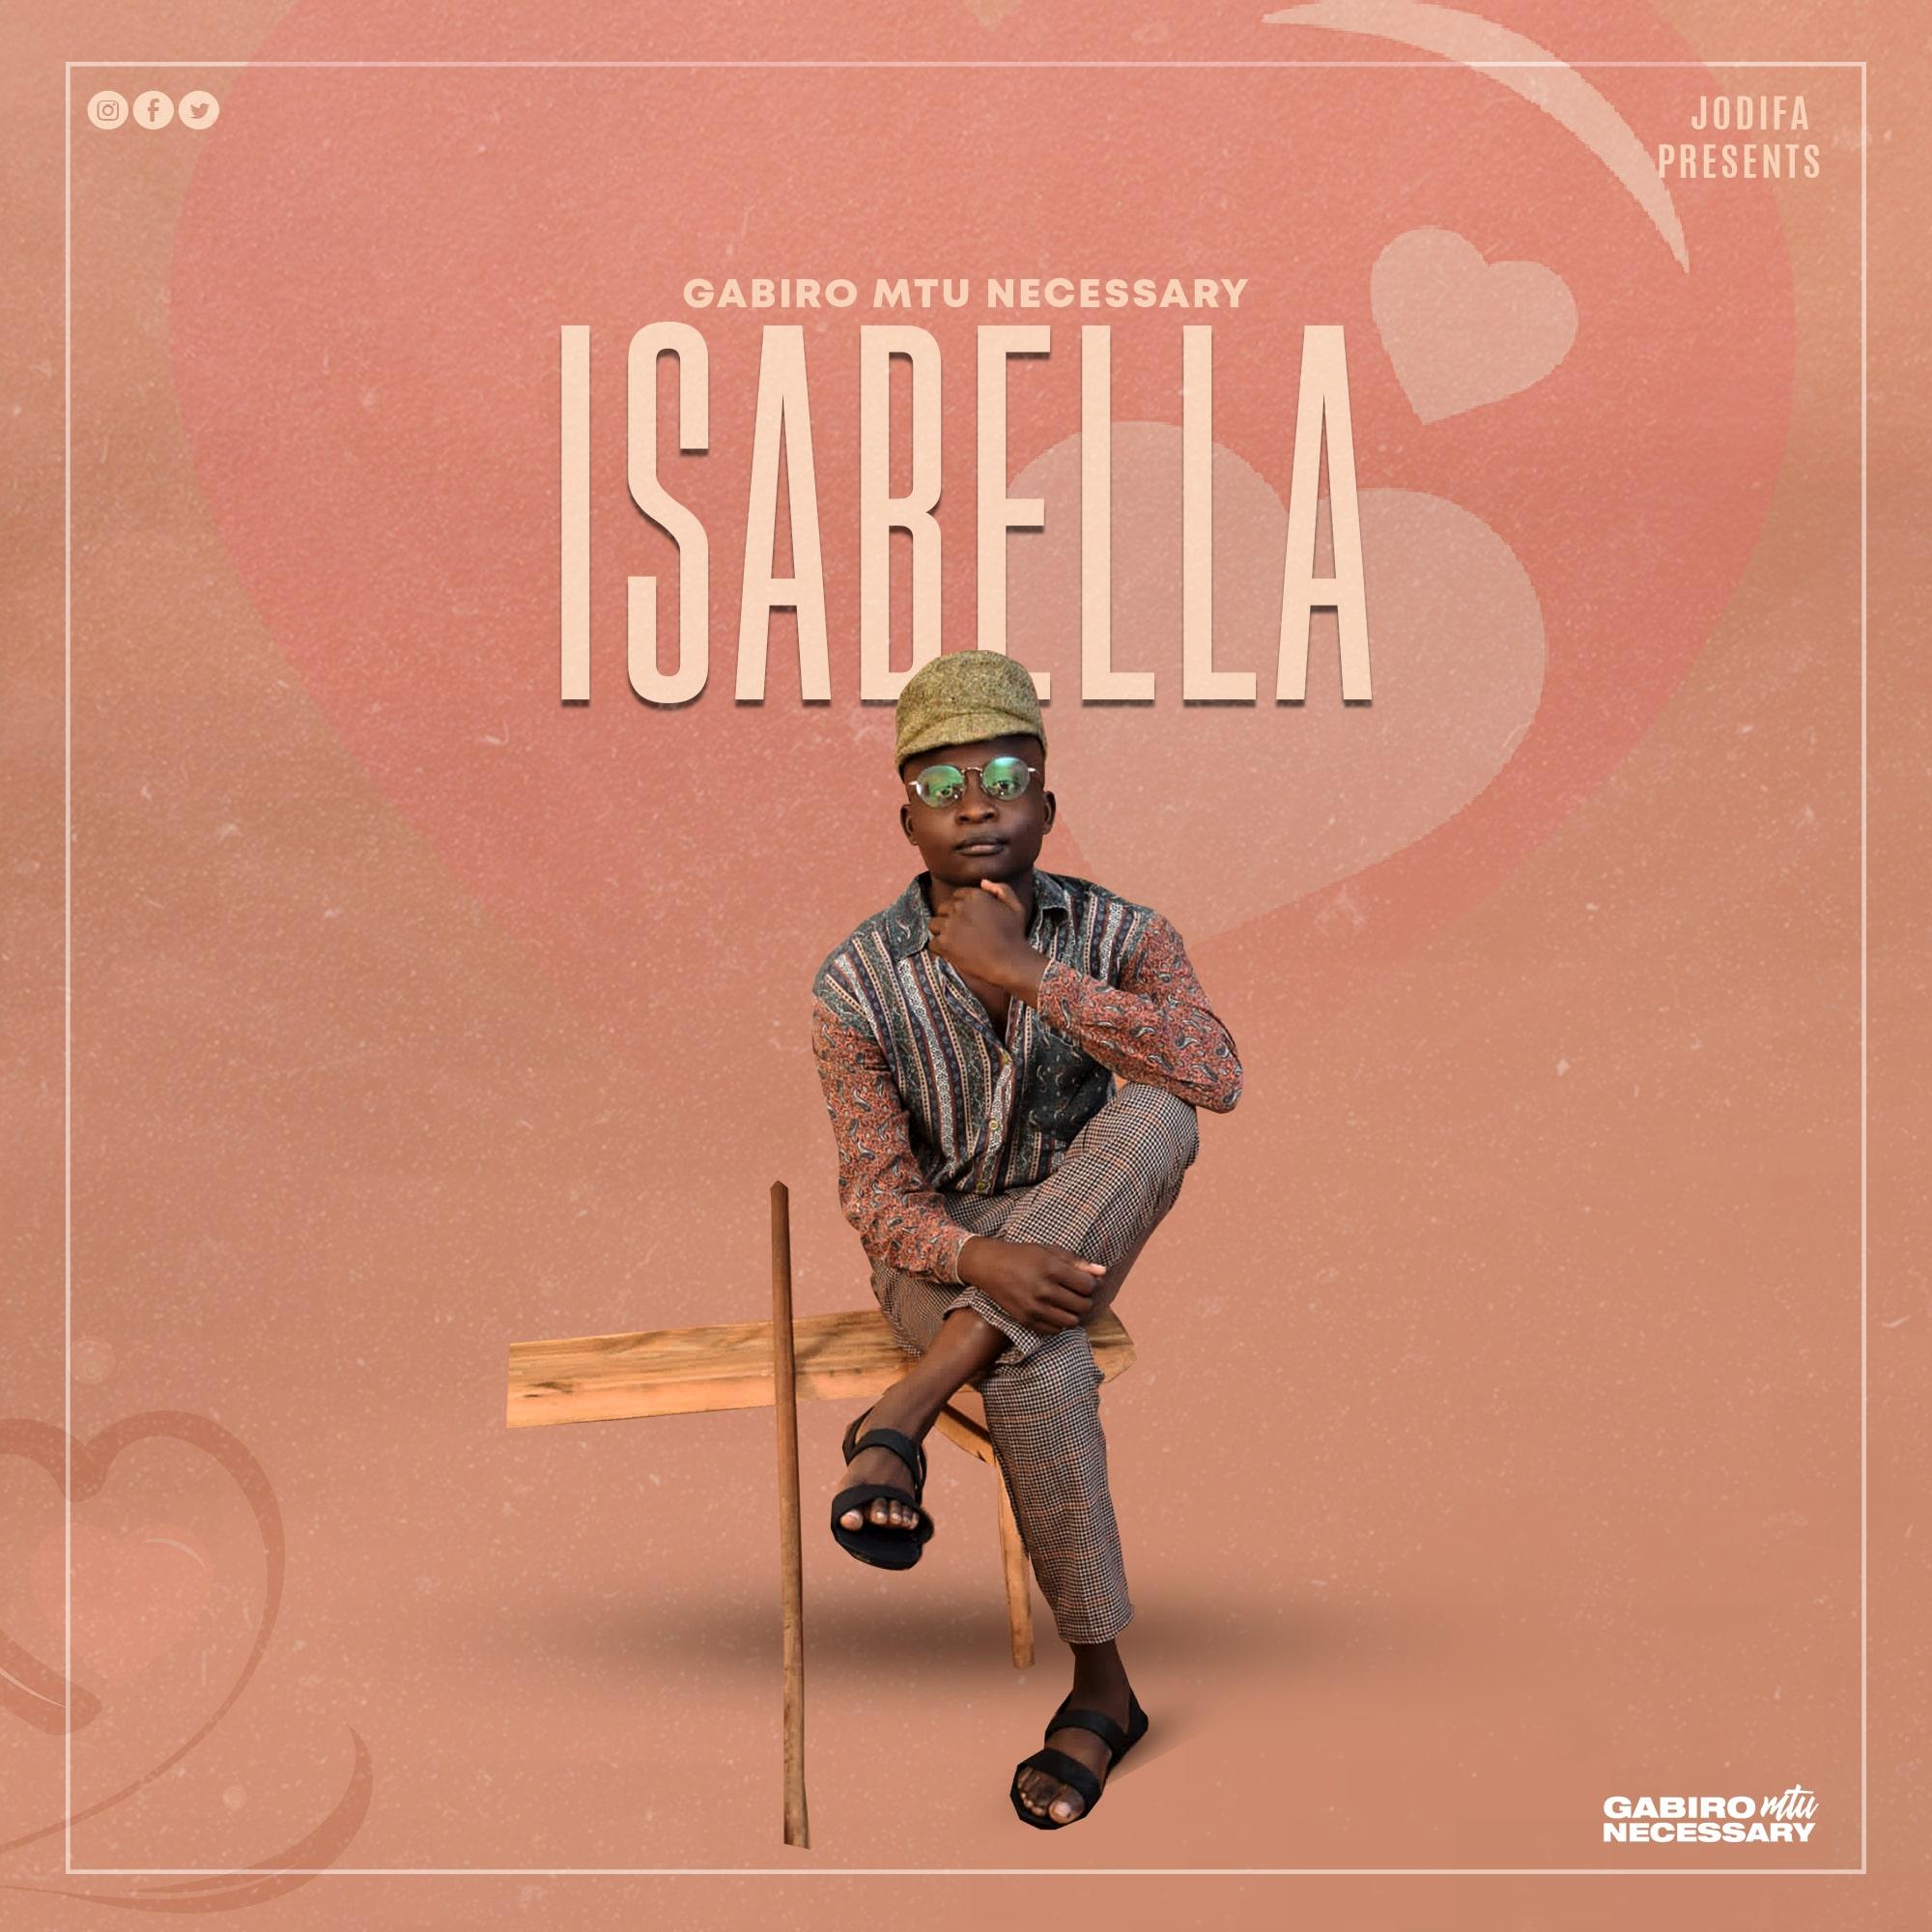 Rising Star Gabiro Mtu Necessary Releases Isabella Music Video